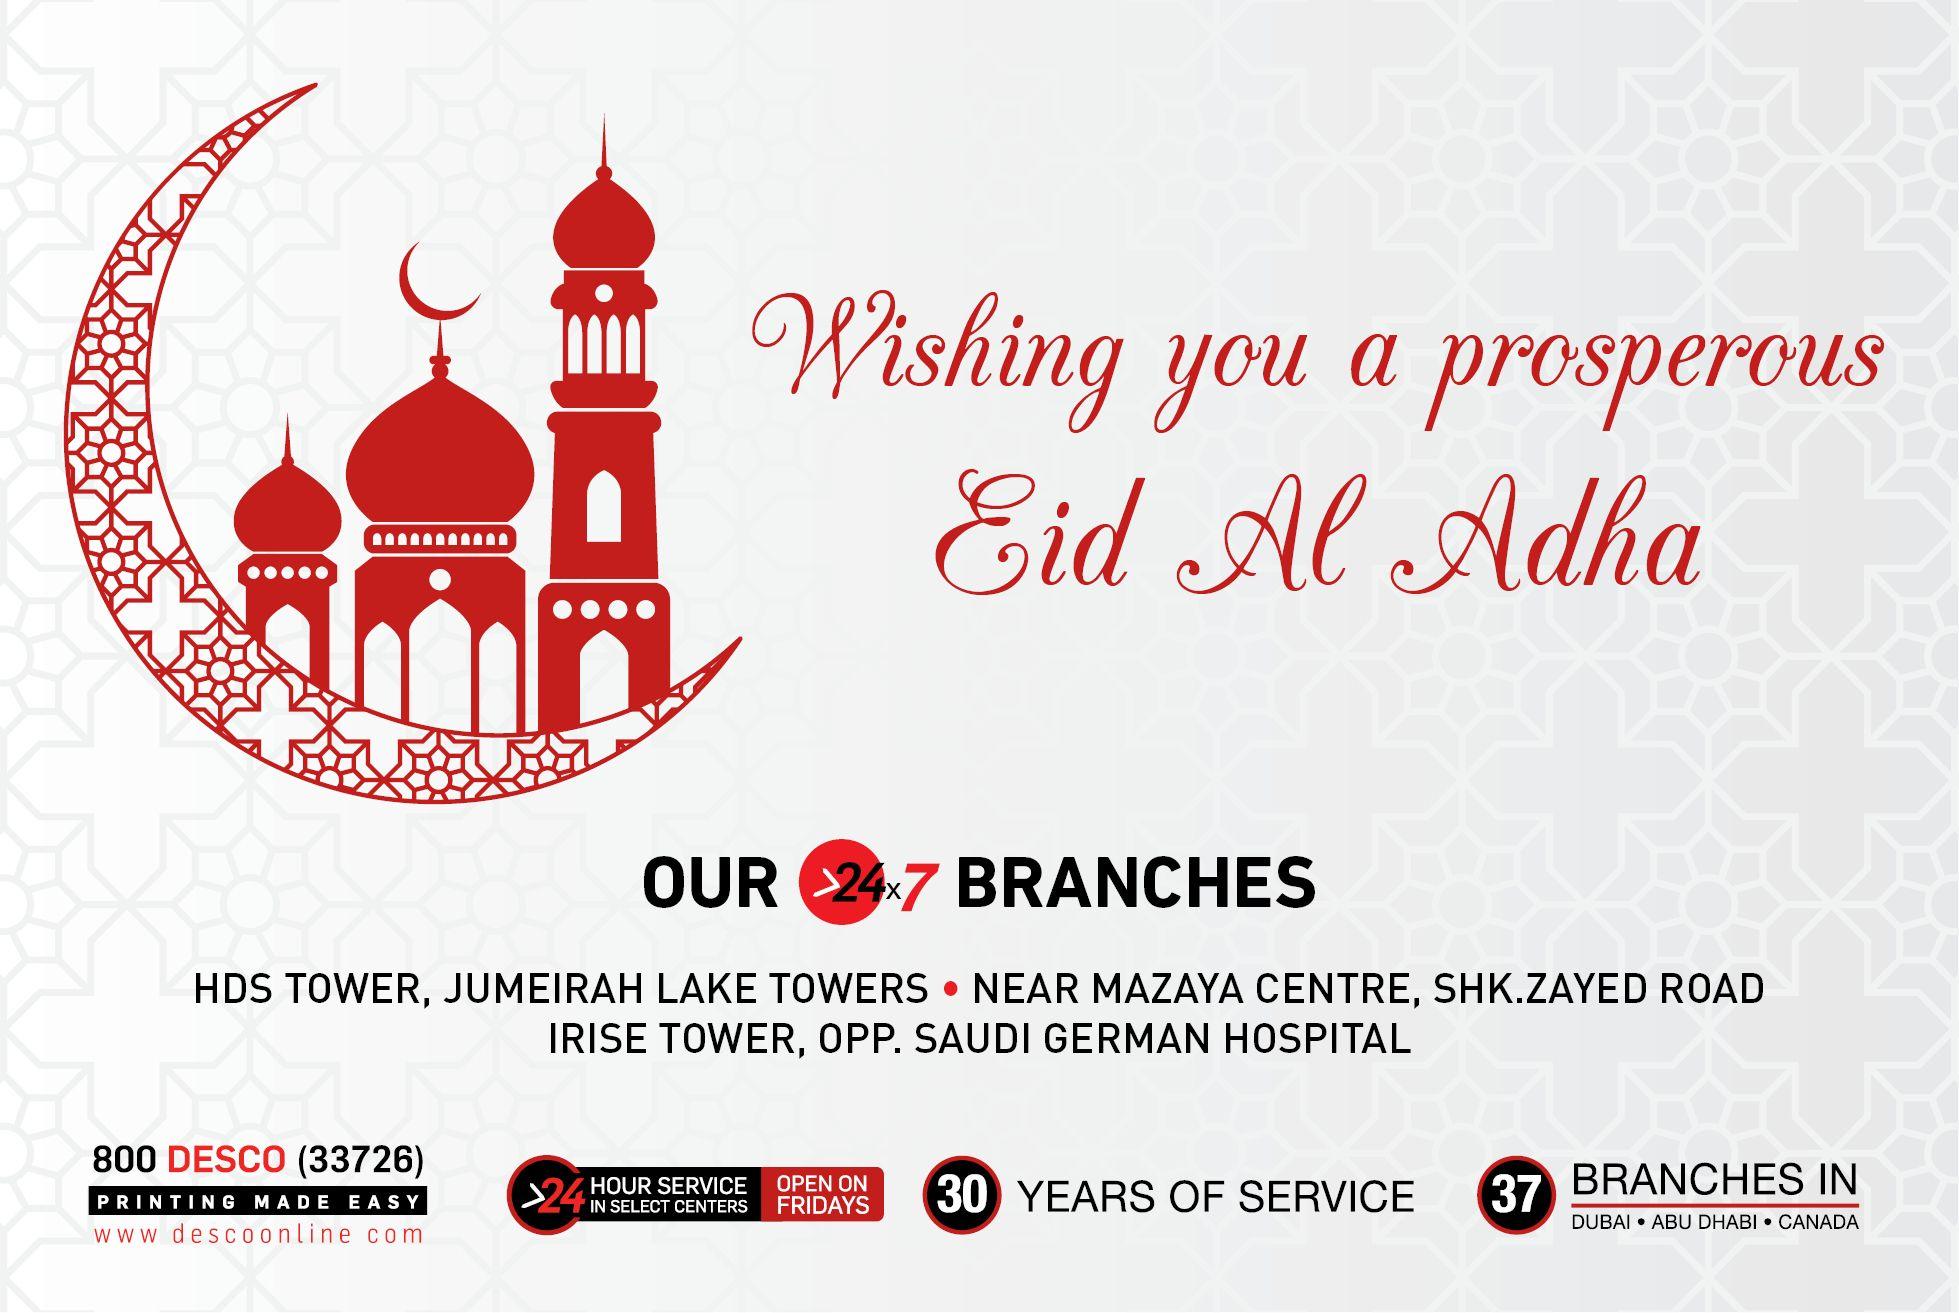 Eid al adha mubarak descoonline com eid al adha eiduladha eidmubarak eid2017 descoprinting dubai